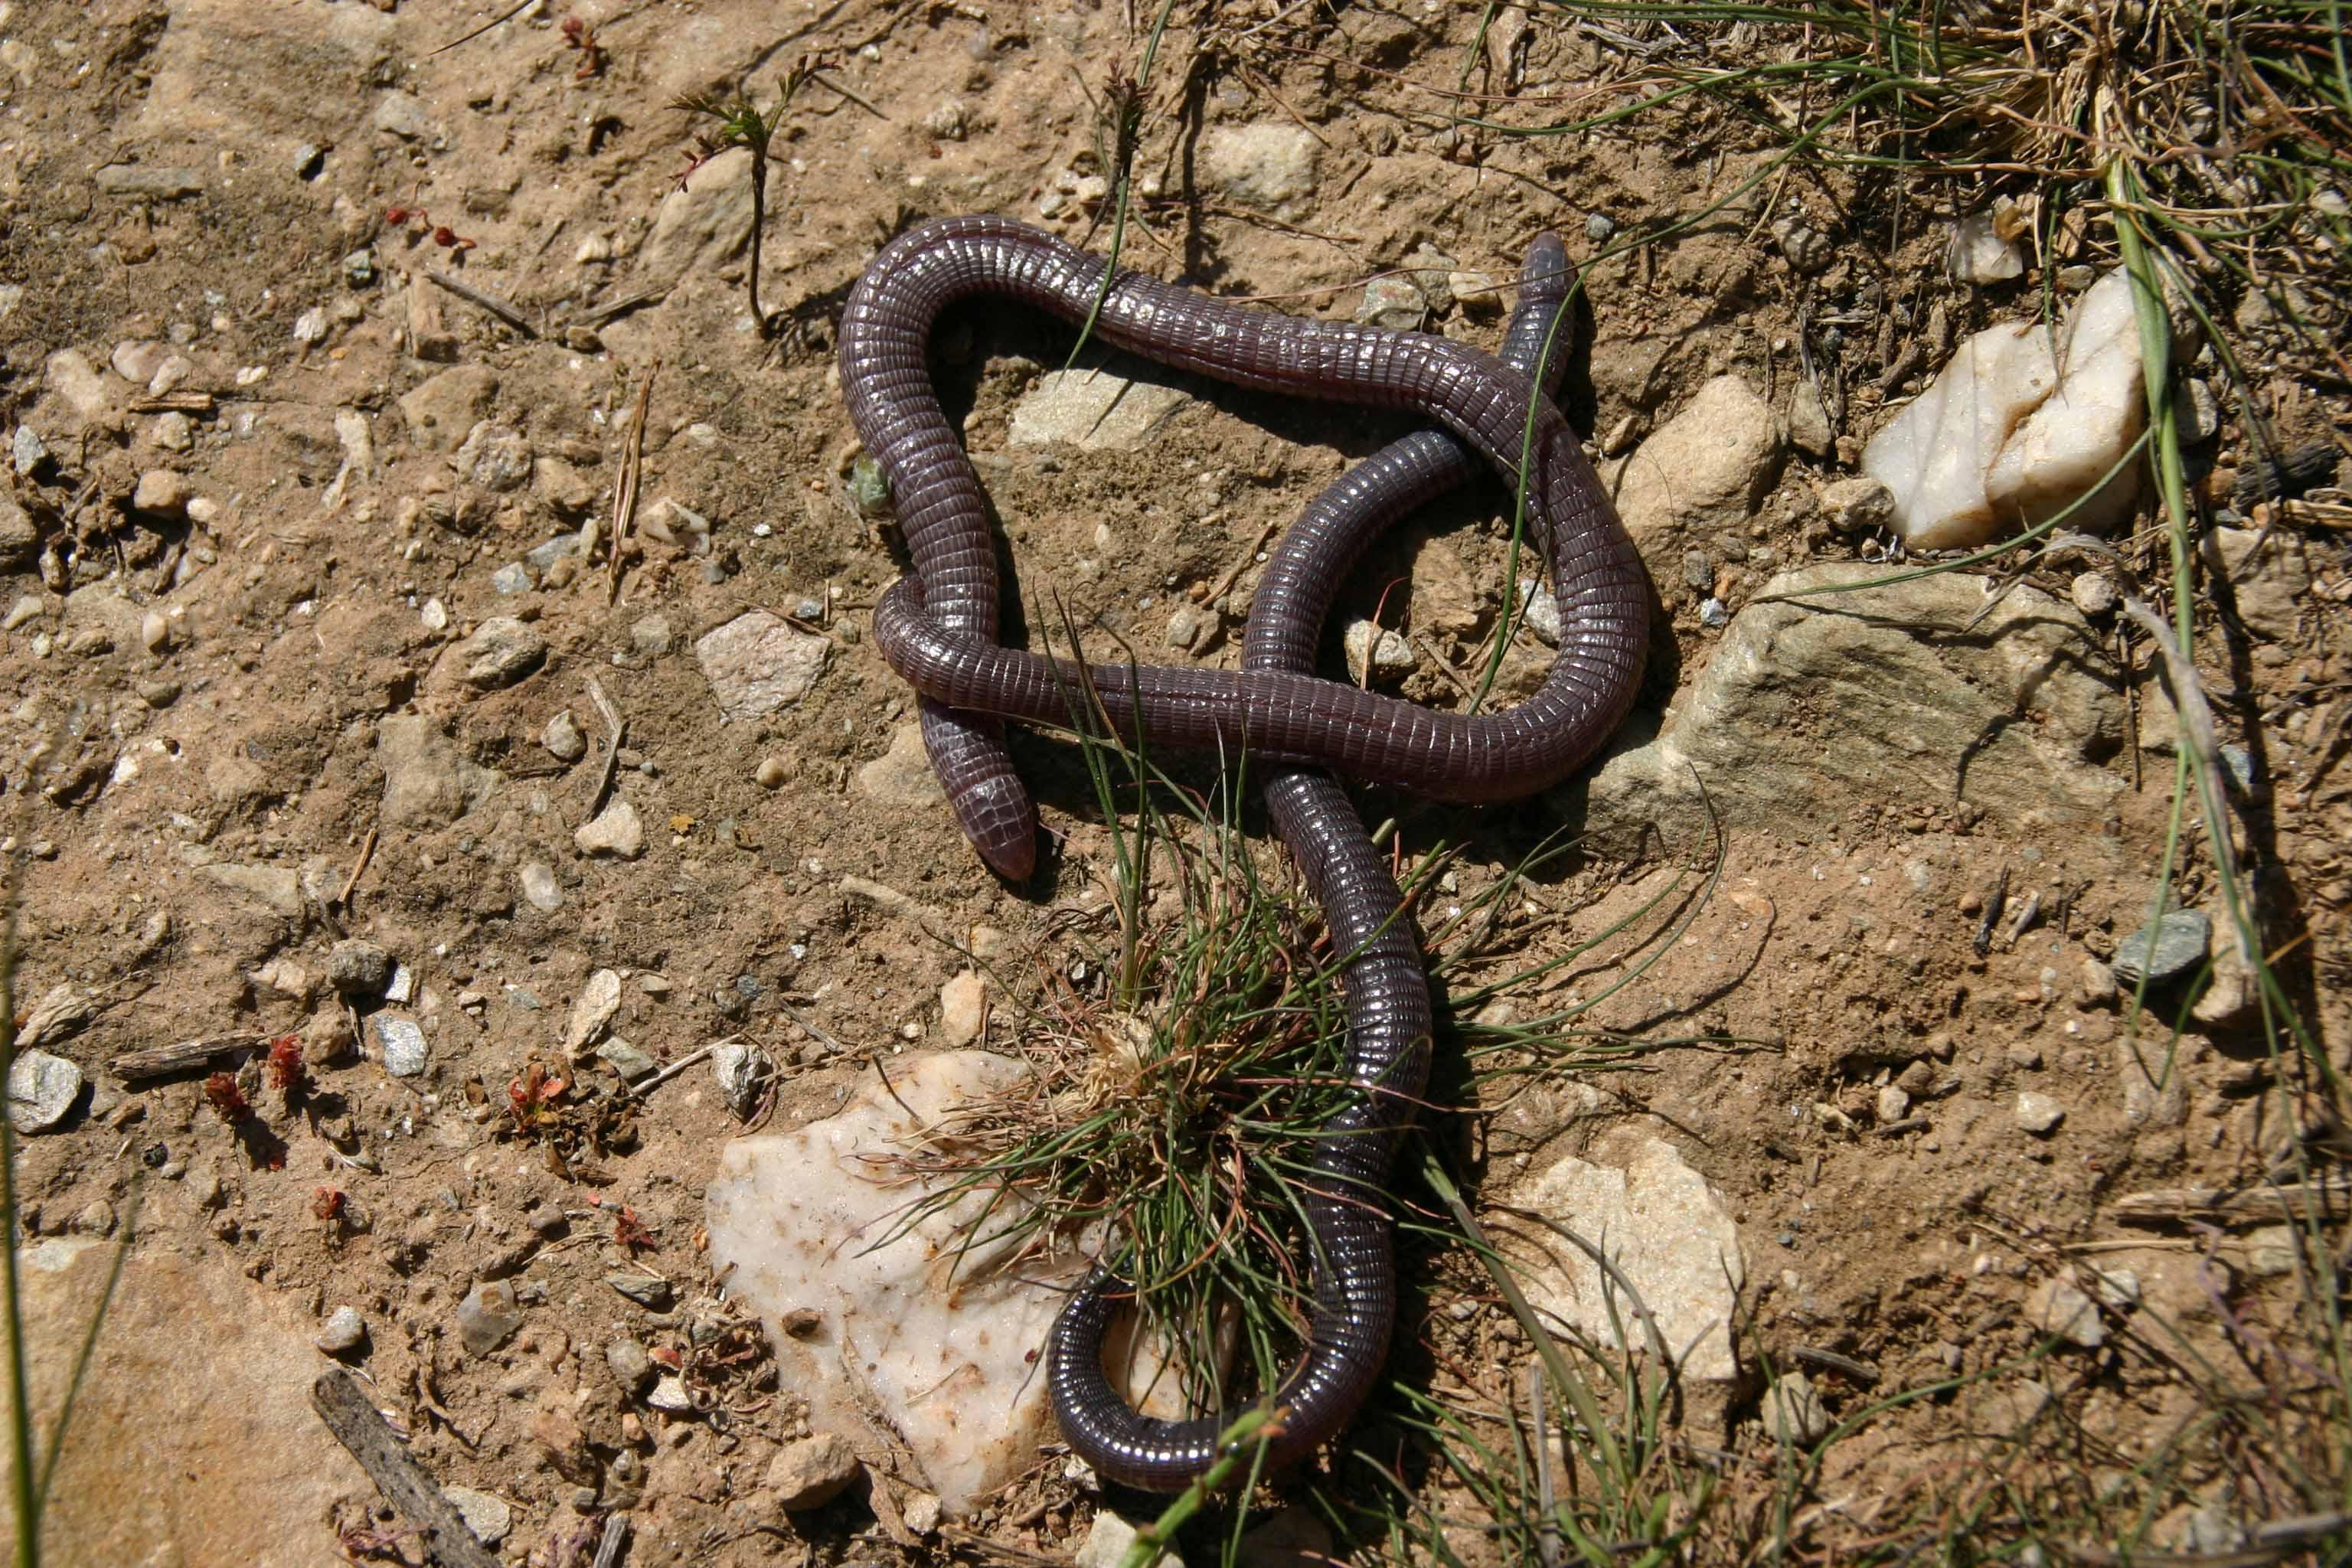 A pair of Iberian worm lizards (Blanus cinereus)